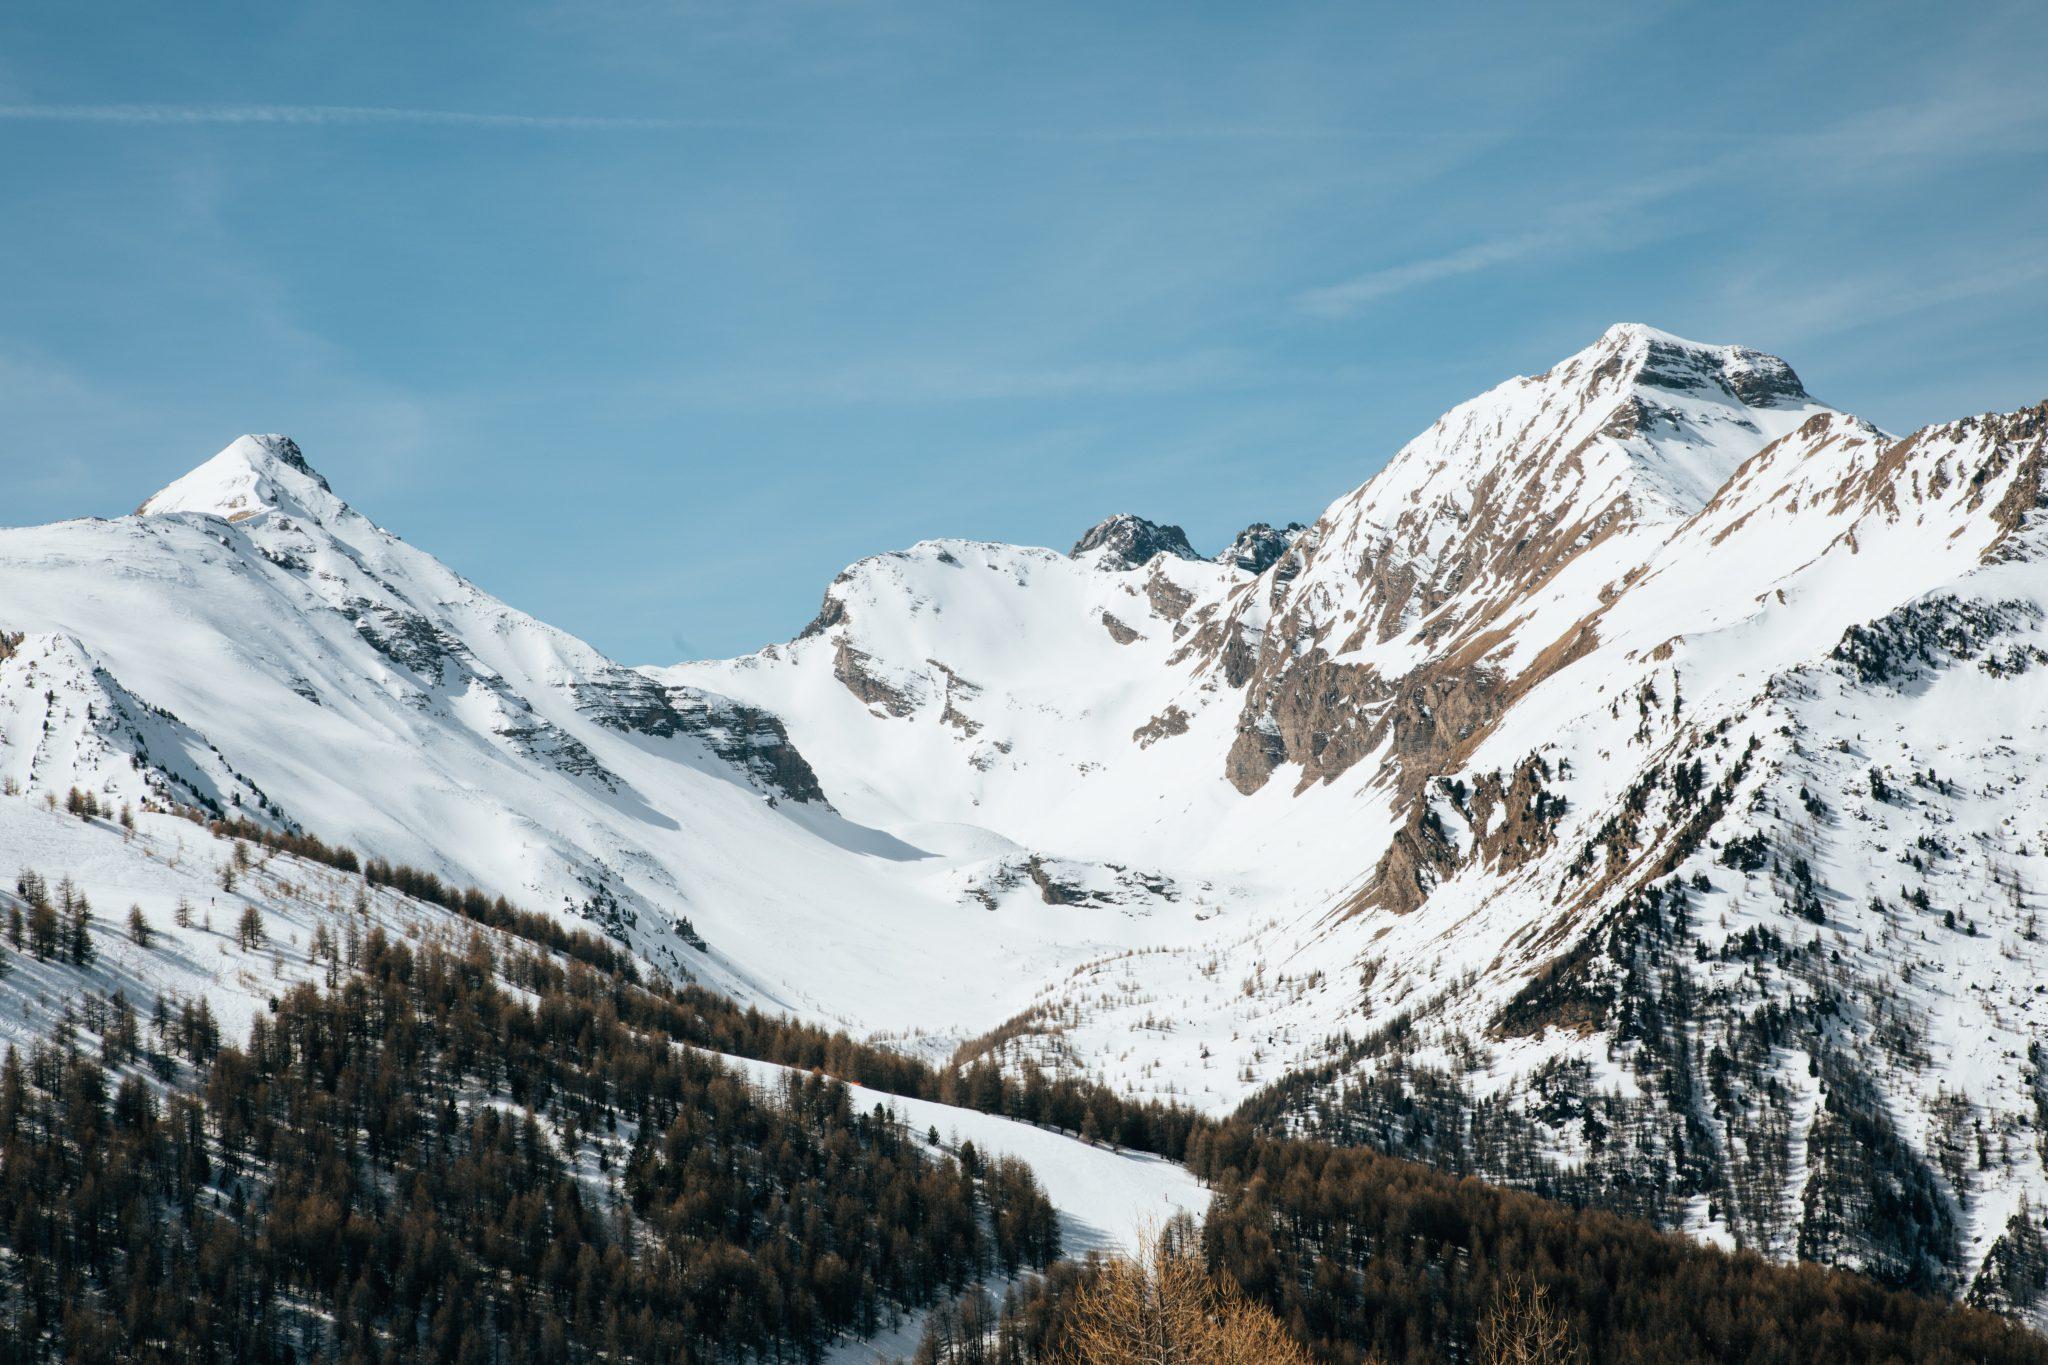 Station de ski Les Orres Alpes du Sud